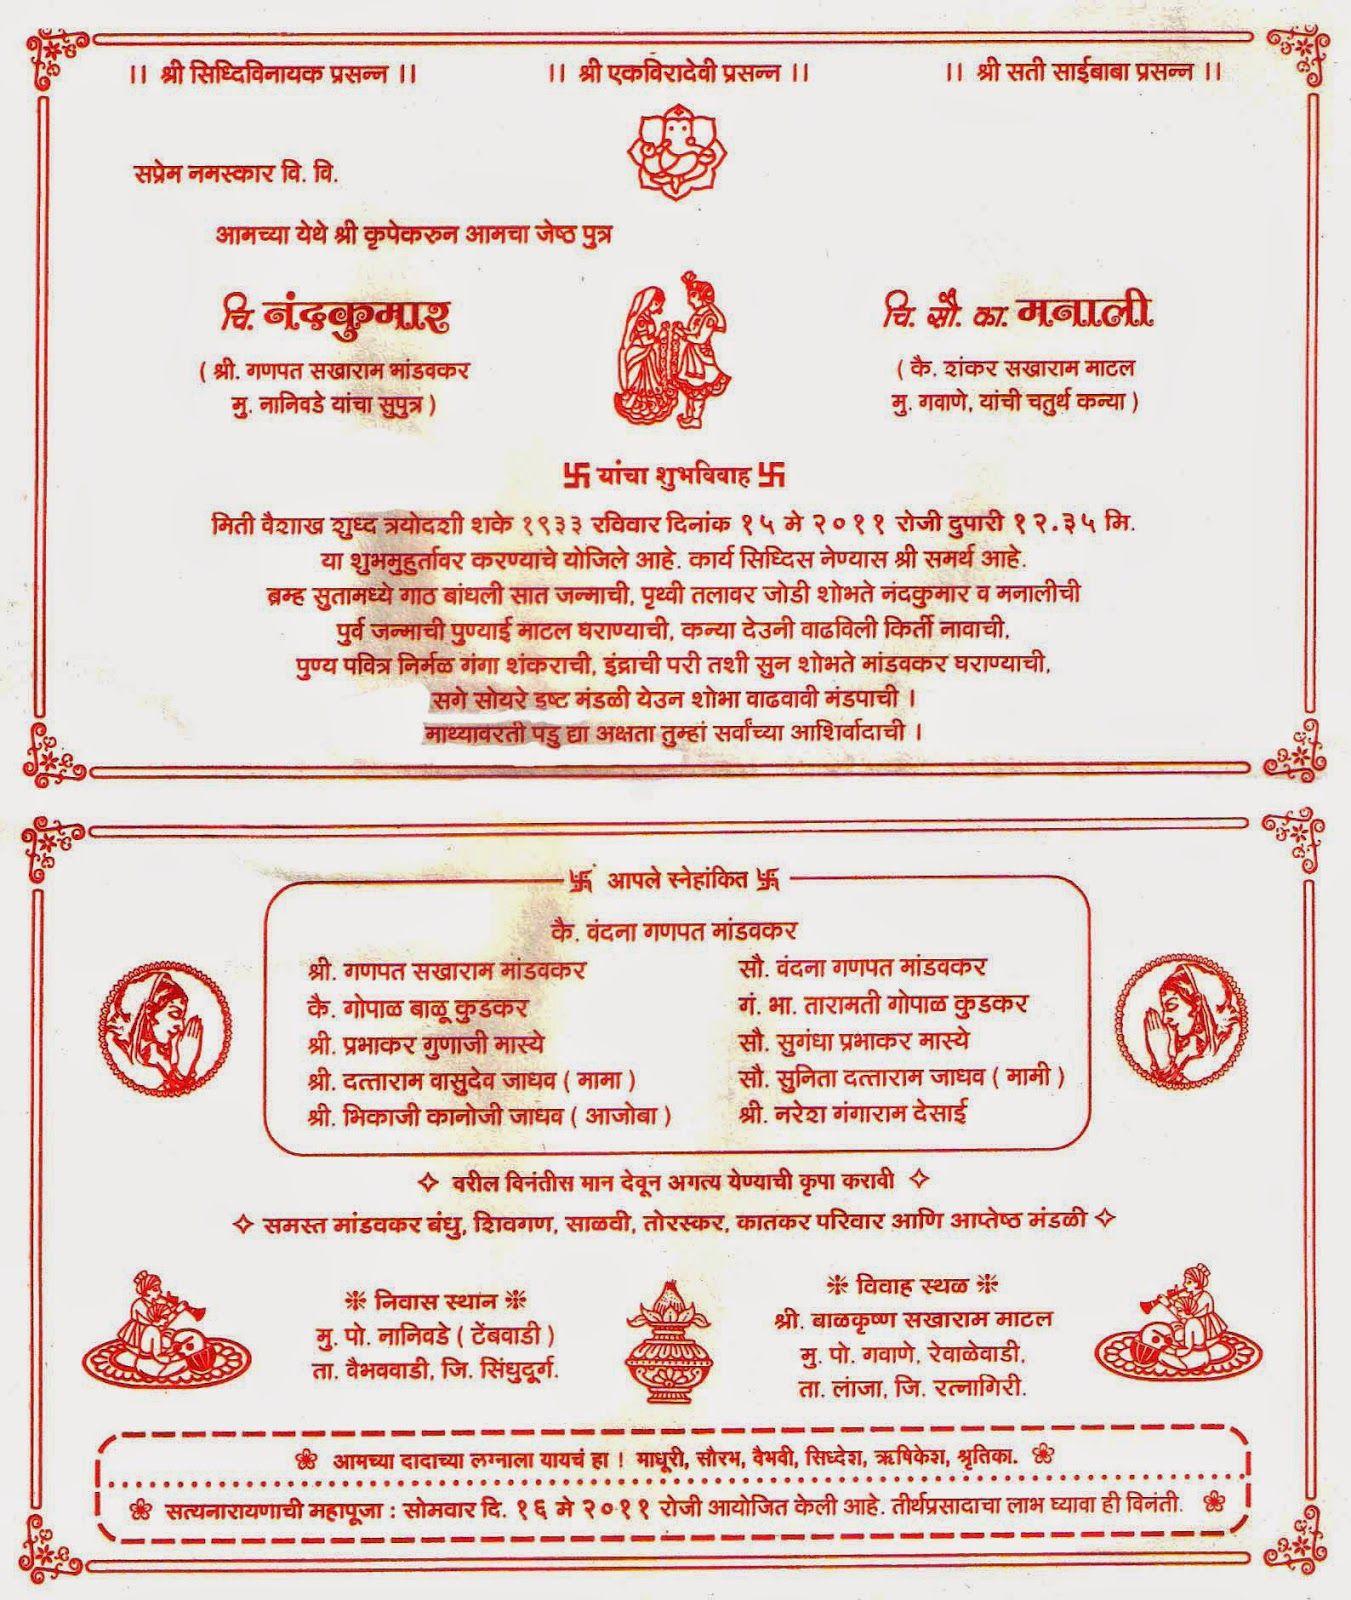 Hindu Wedding Invitation Quotes In Marathi Fresh